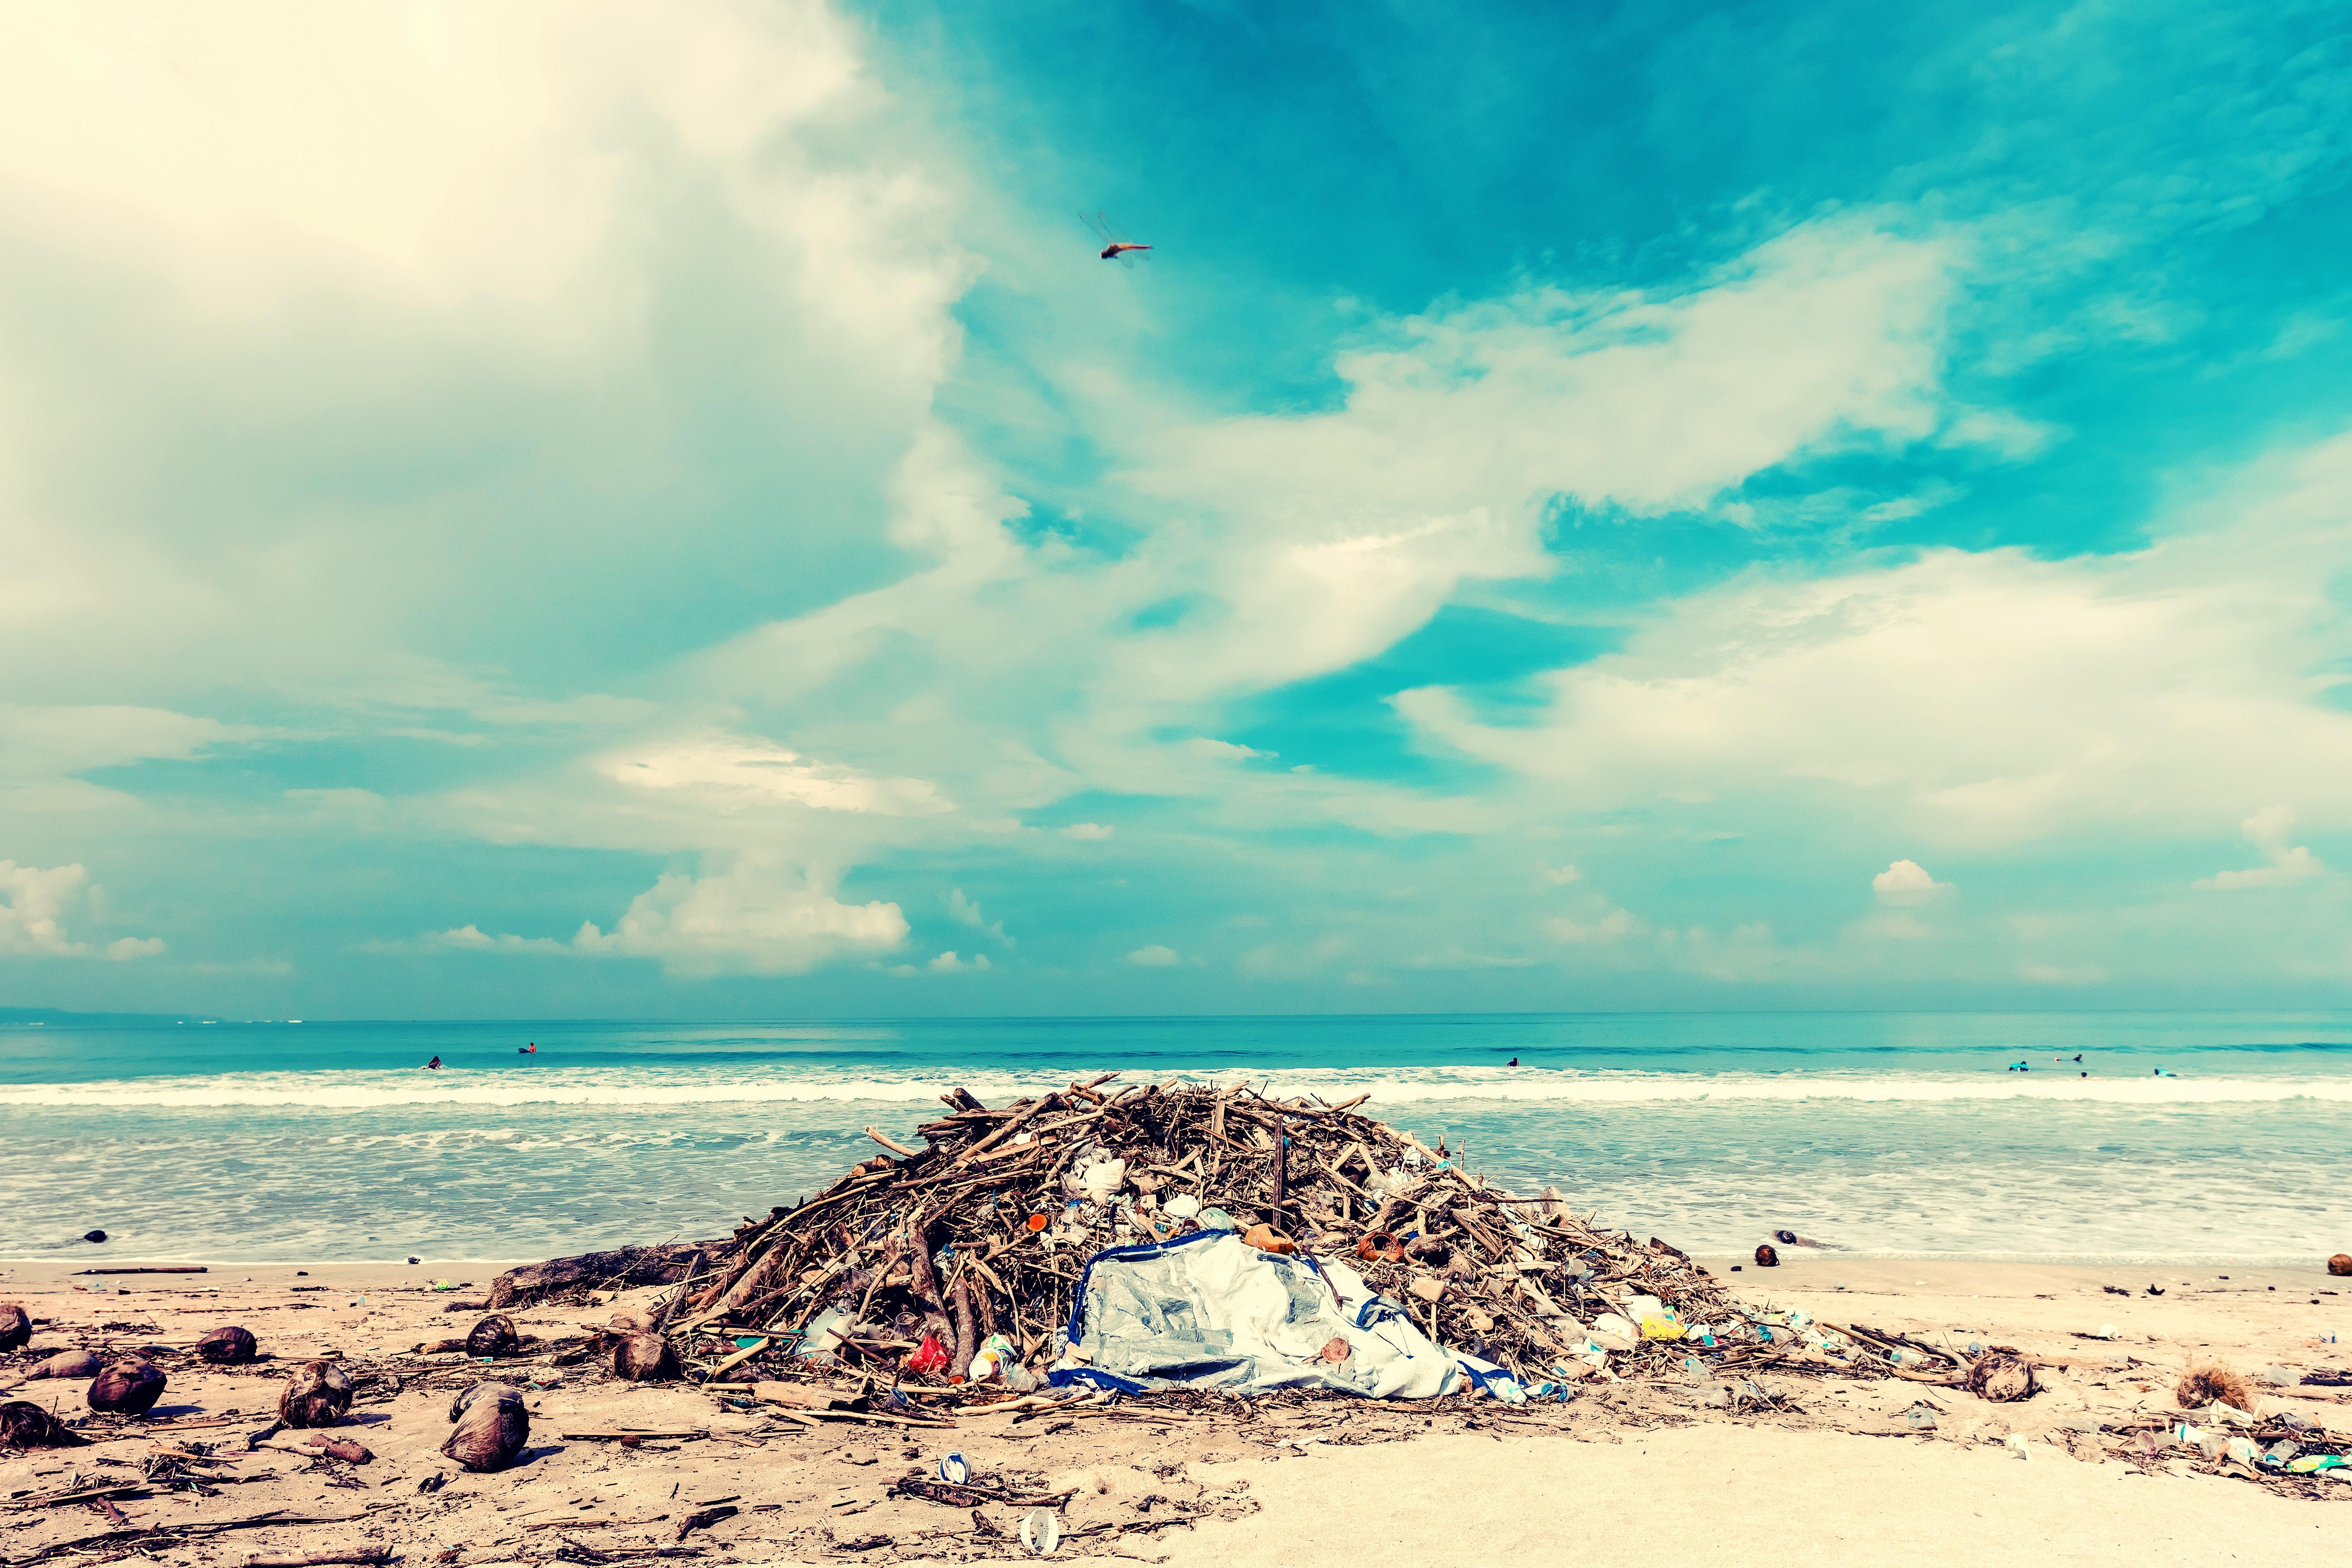 pile of gabage on beach